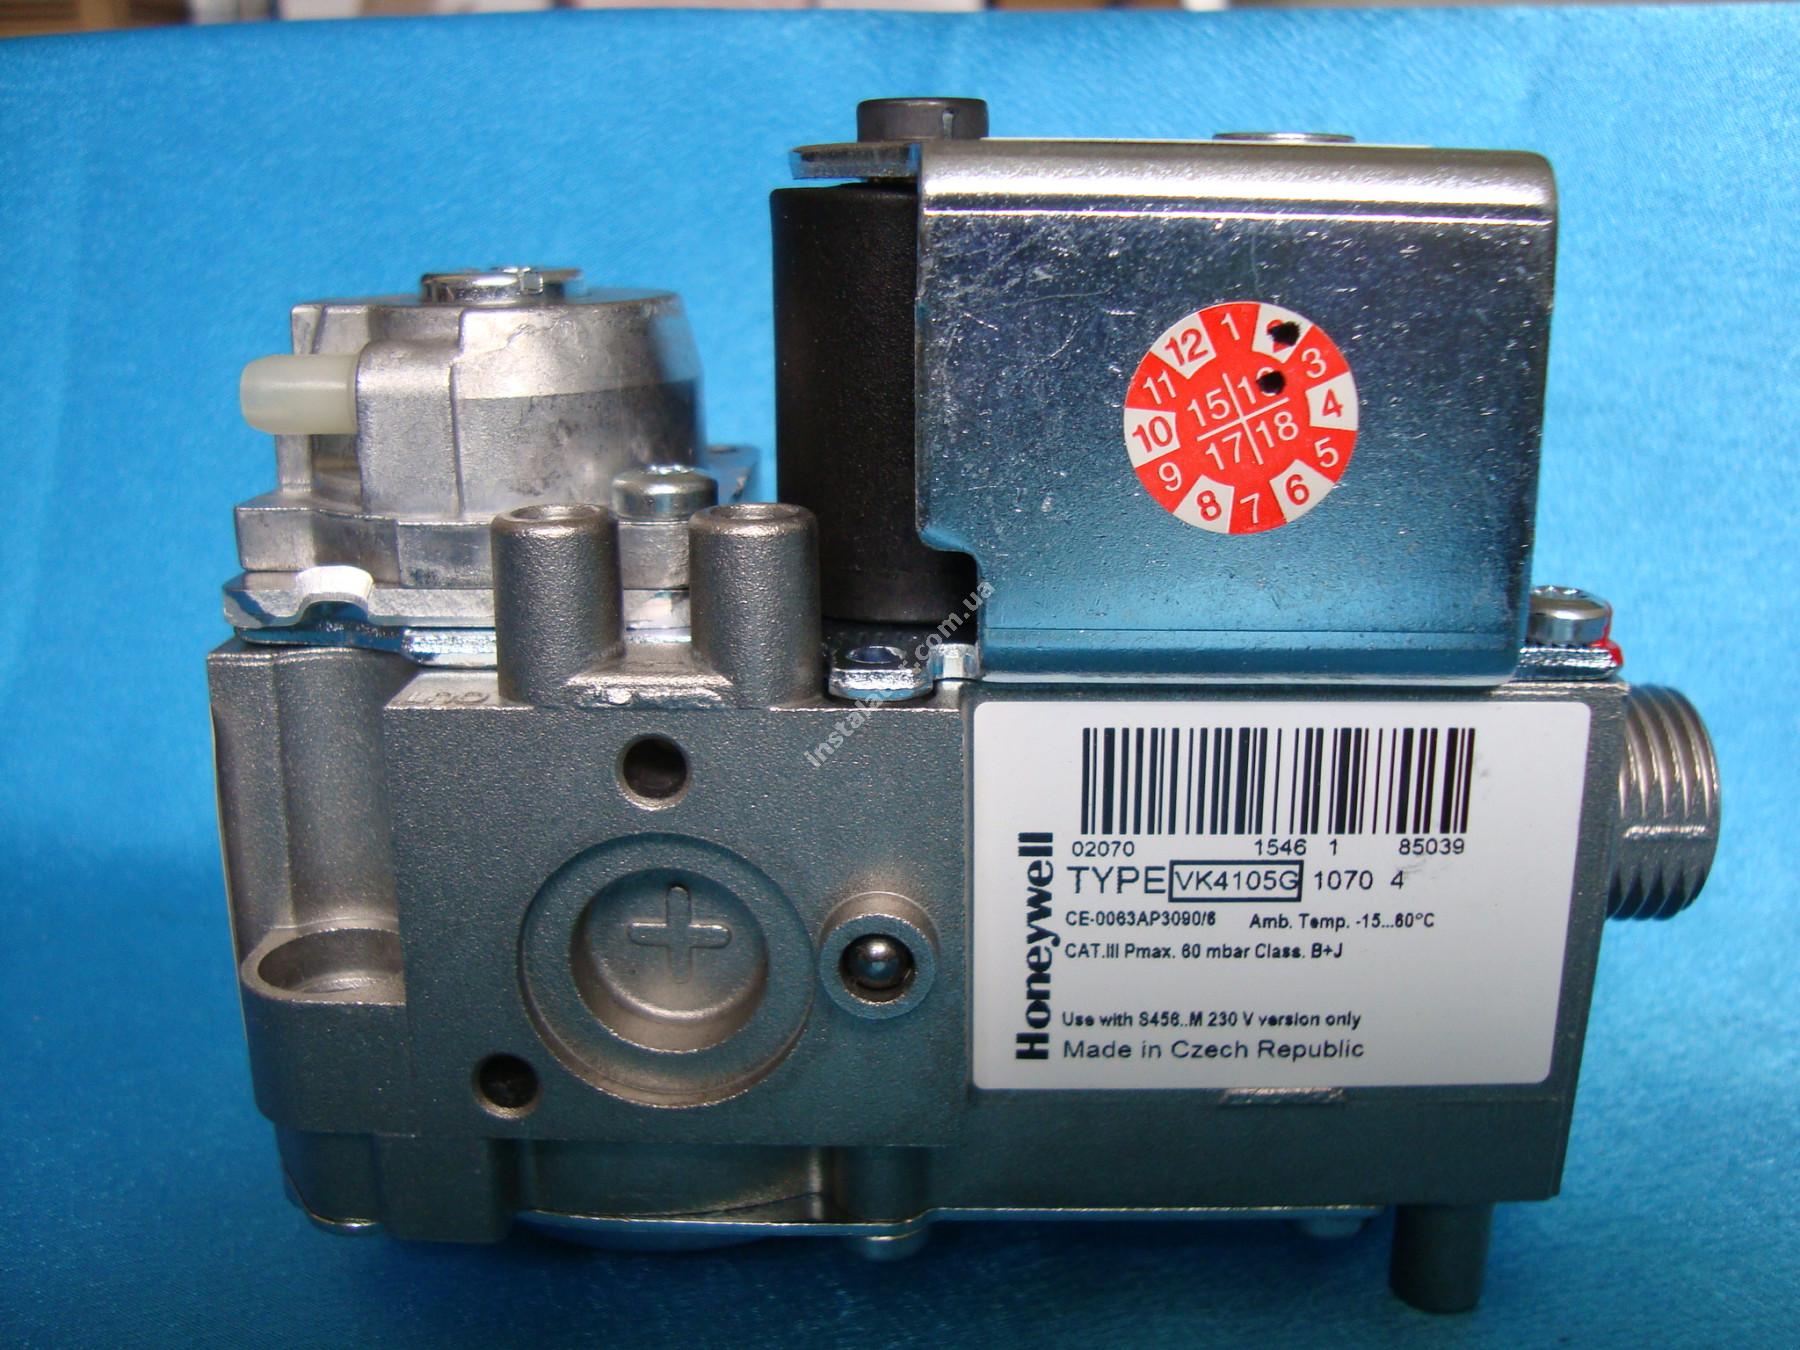 39804880 Газовий клапан FERROLI Domina, Domitop full-image-2